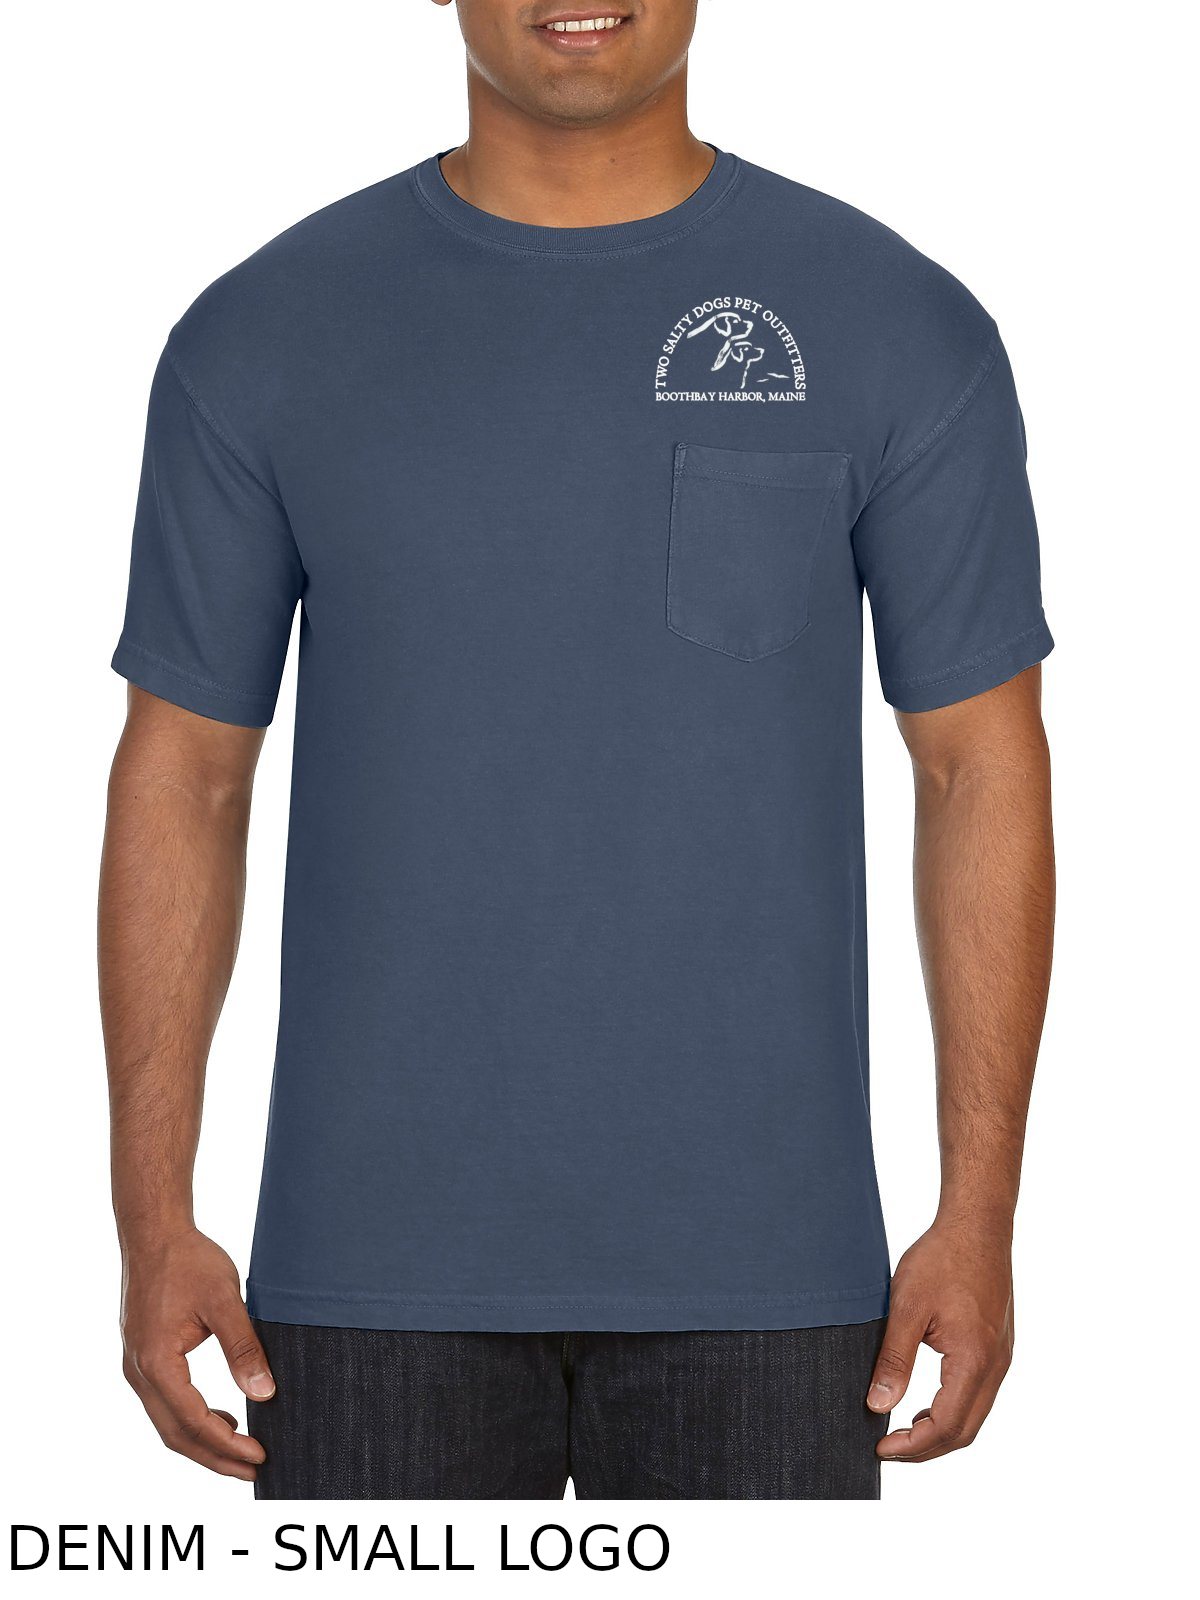 bbha-ss-t-shirt-pocket-denim-front-small-logo